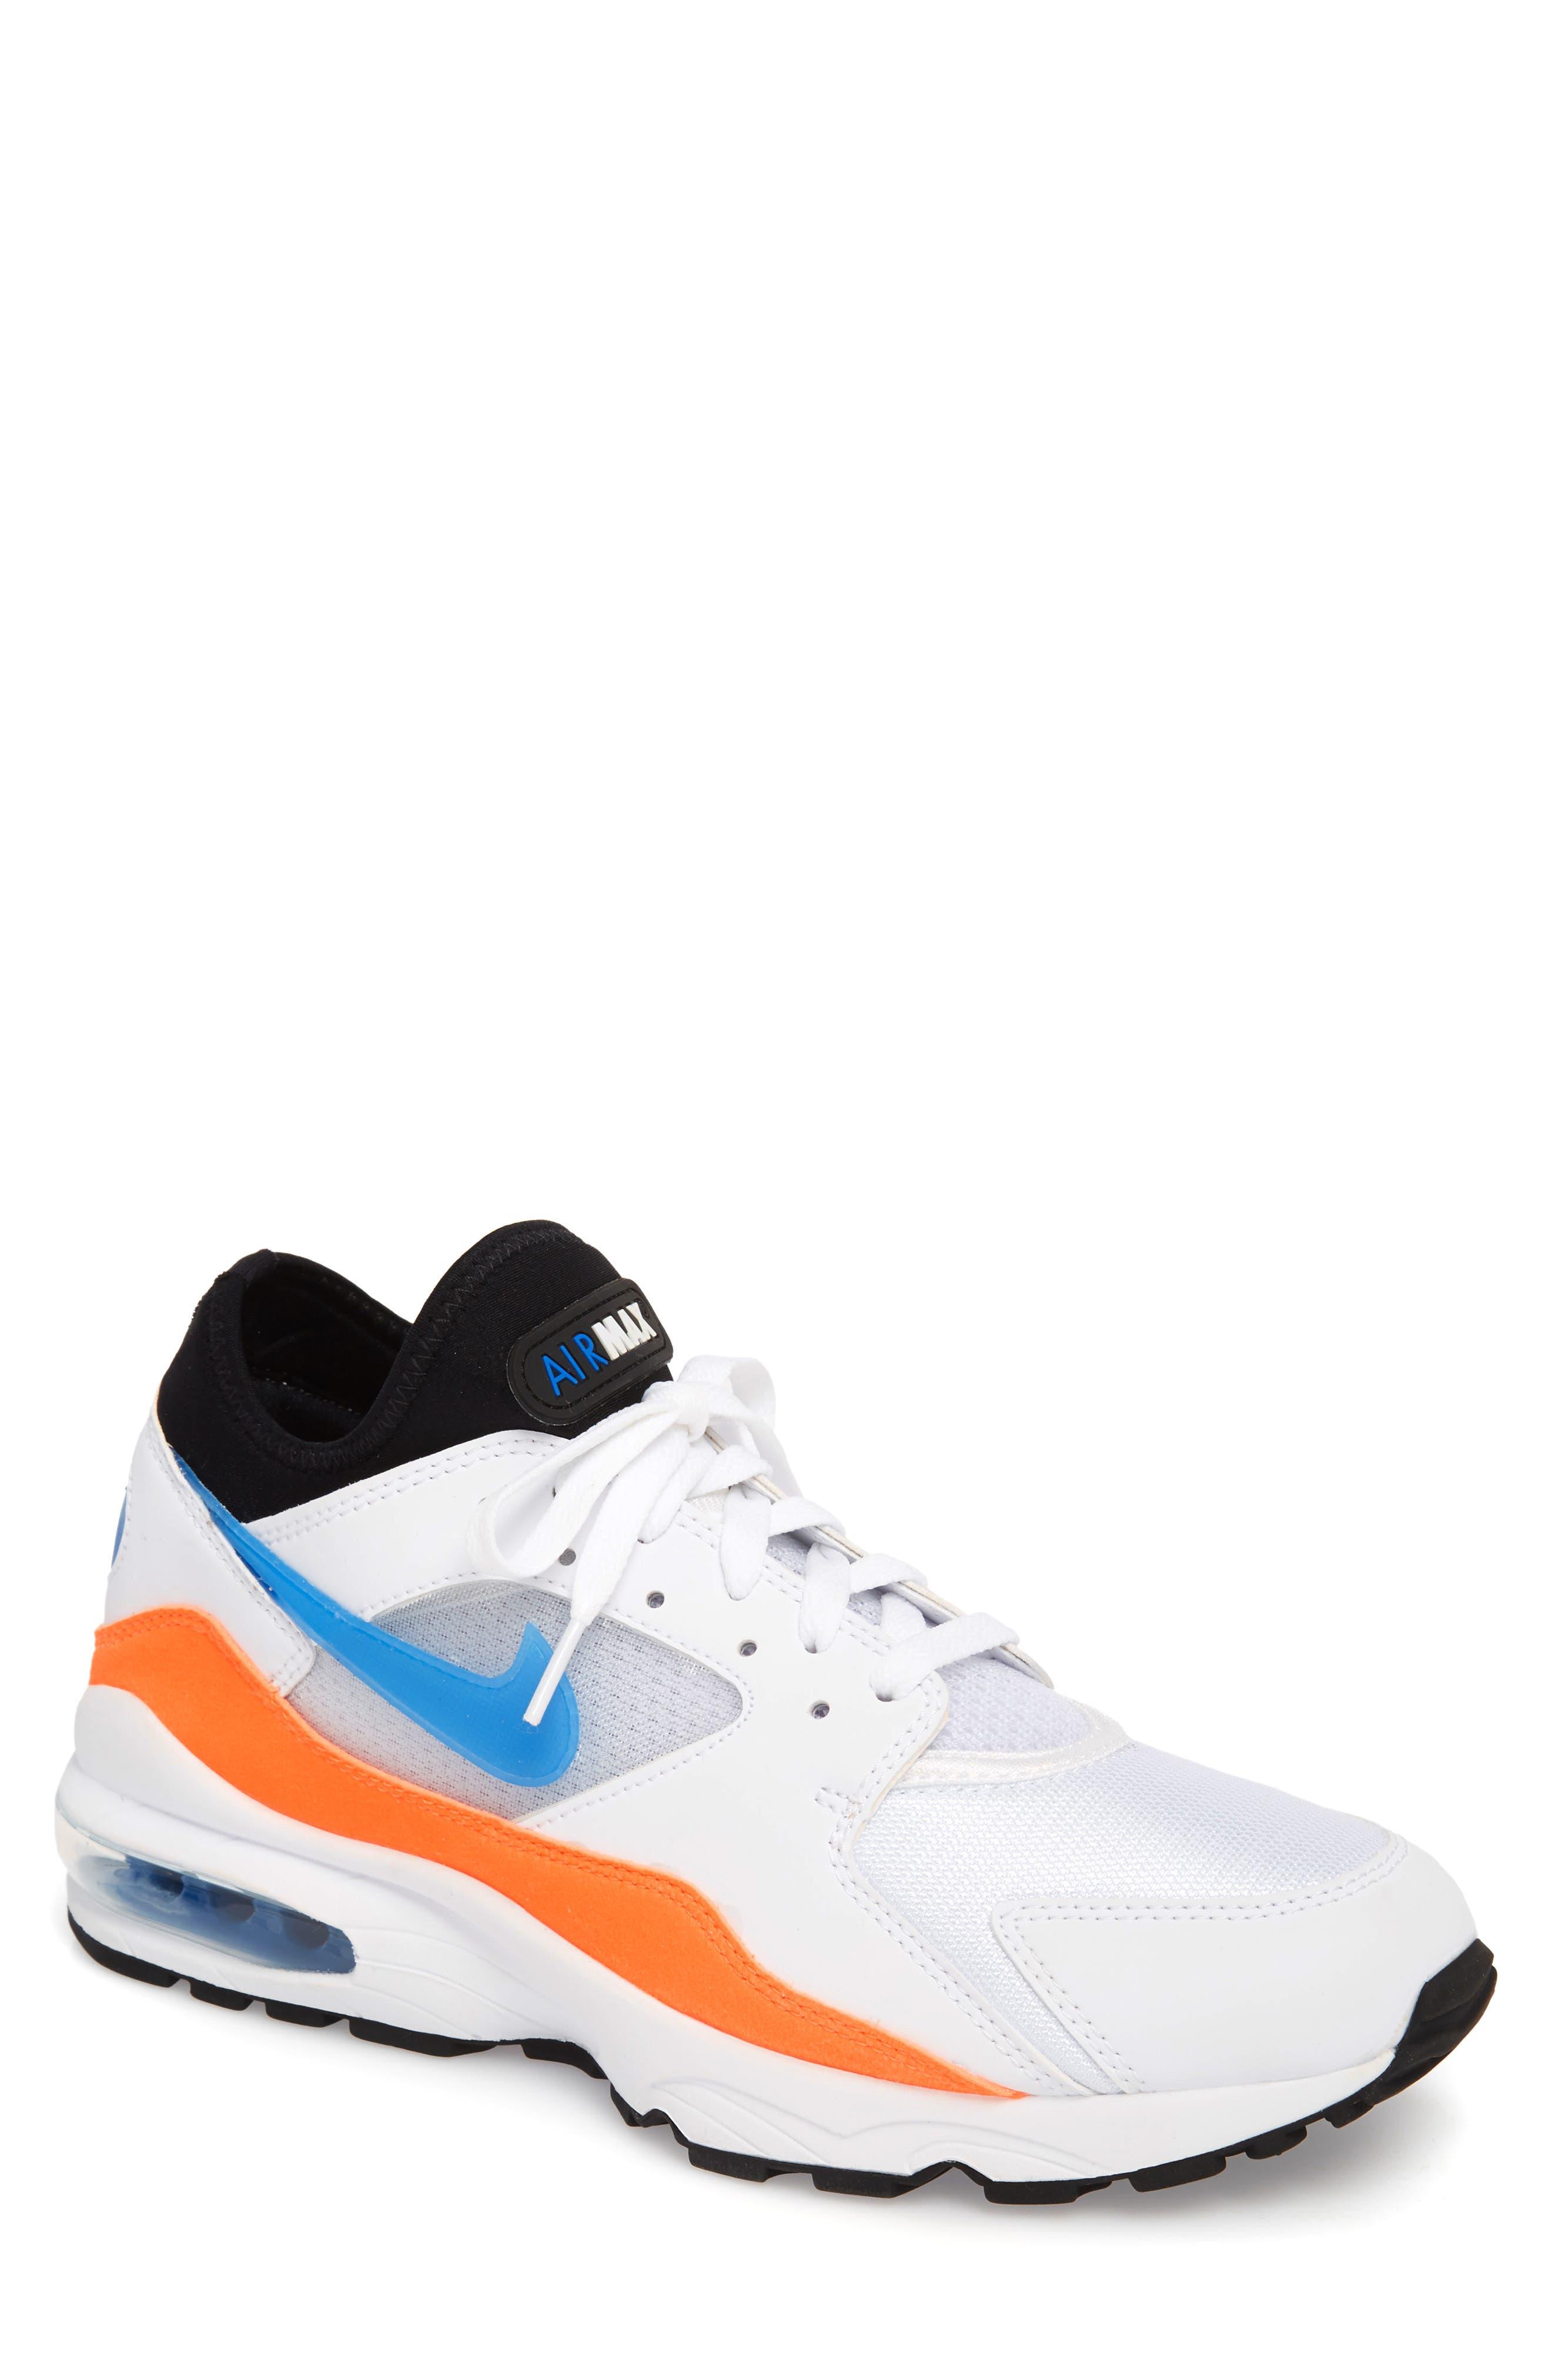 Air Max 93 Sneaker,                             Main thumbnail 1, color,                             White/ Blue Nebula/ Orange